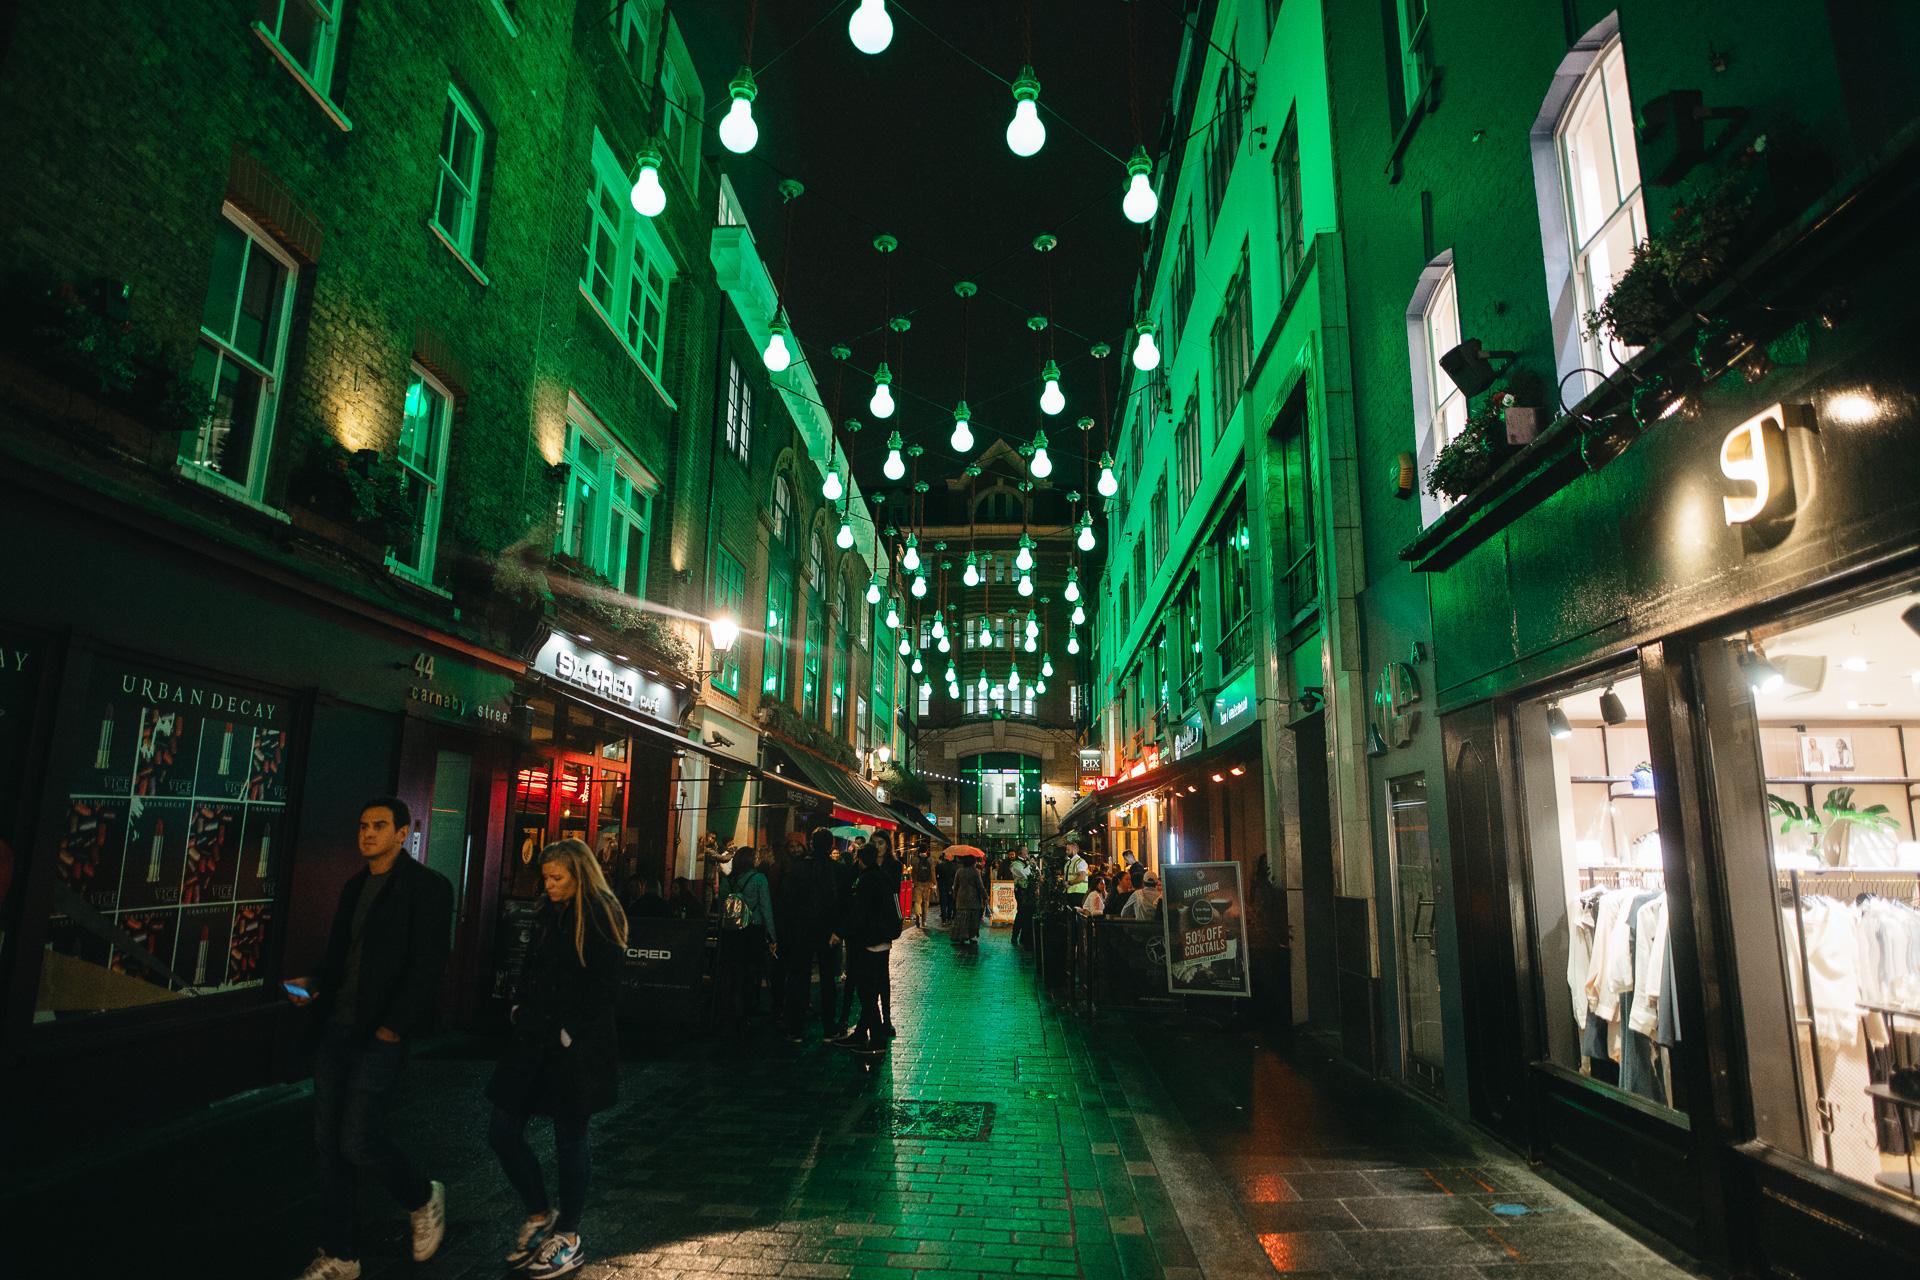 gabor_lenart_london_photographer_street_blogger_lifestyle_img_5190